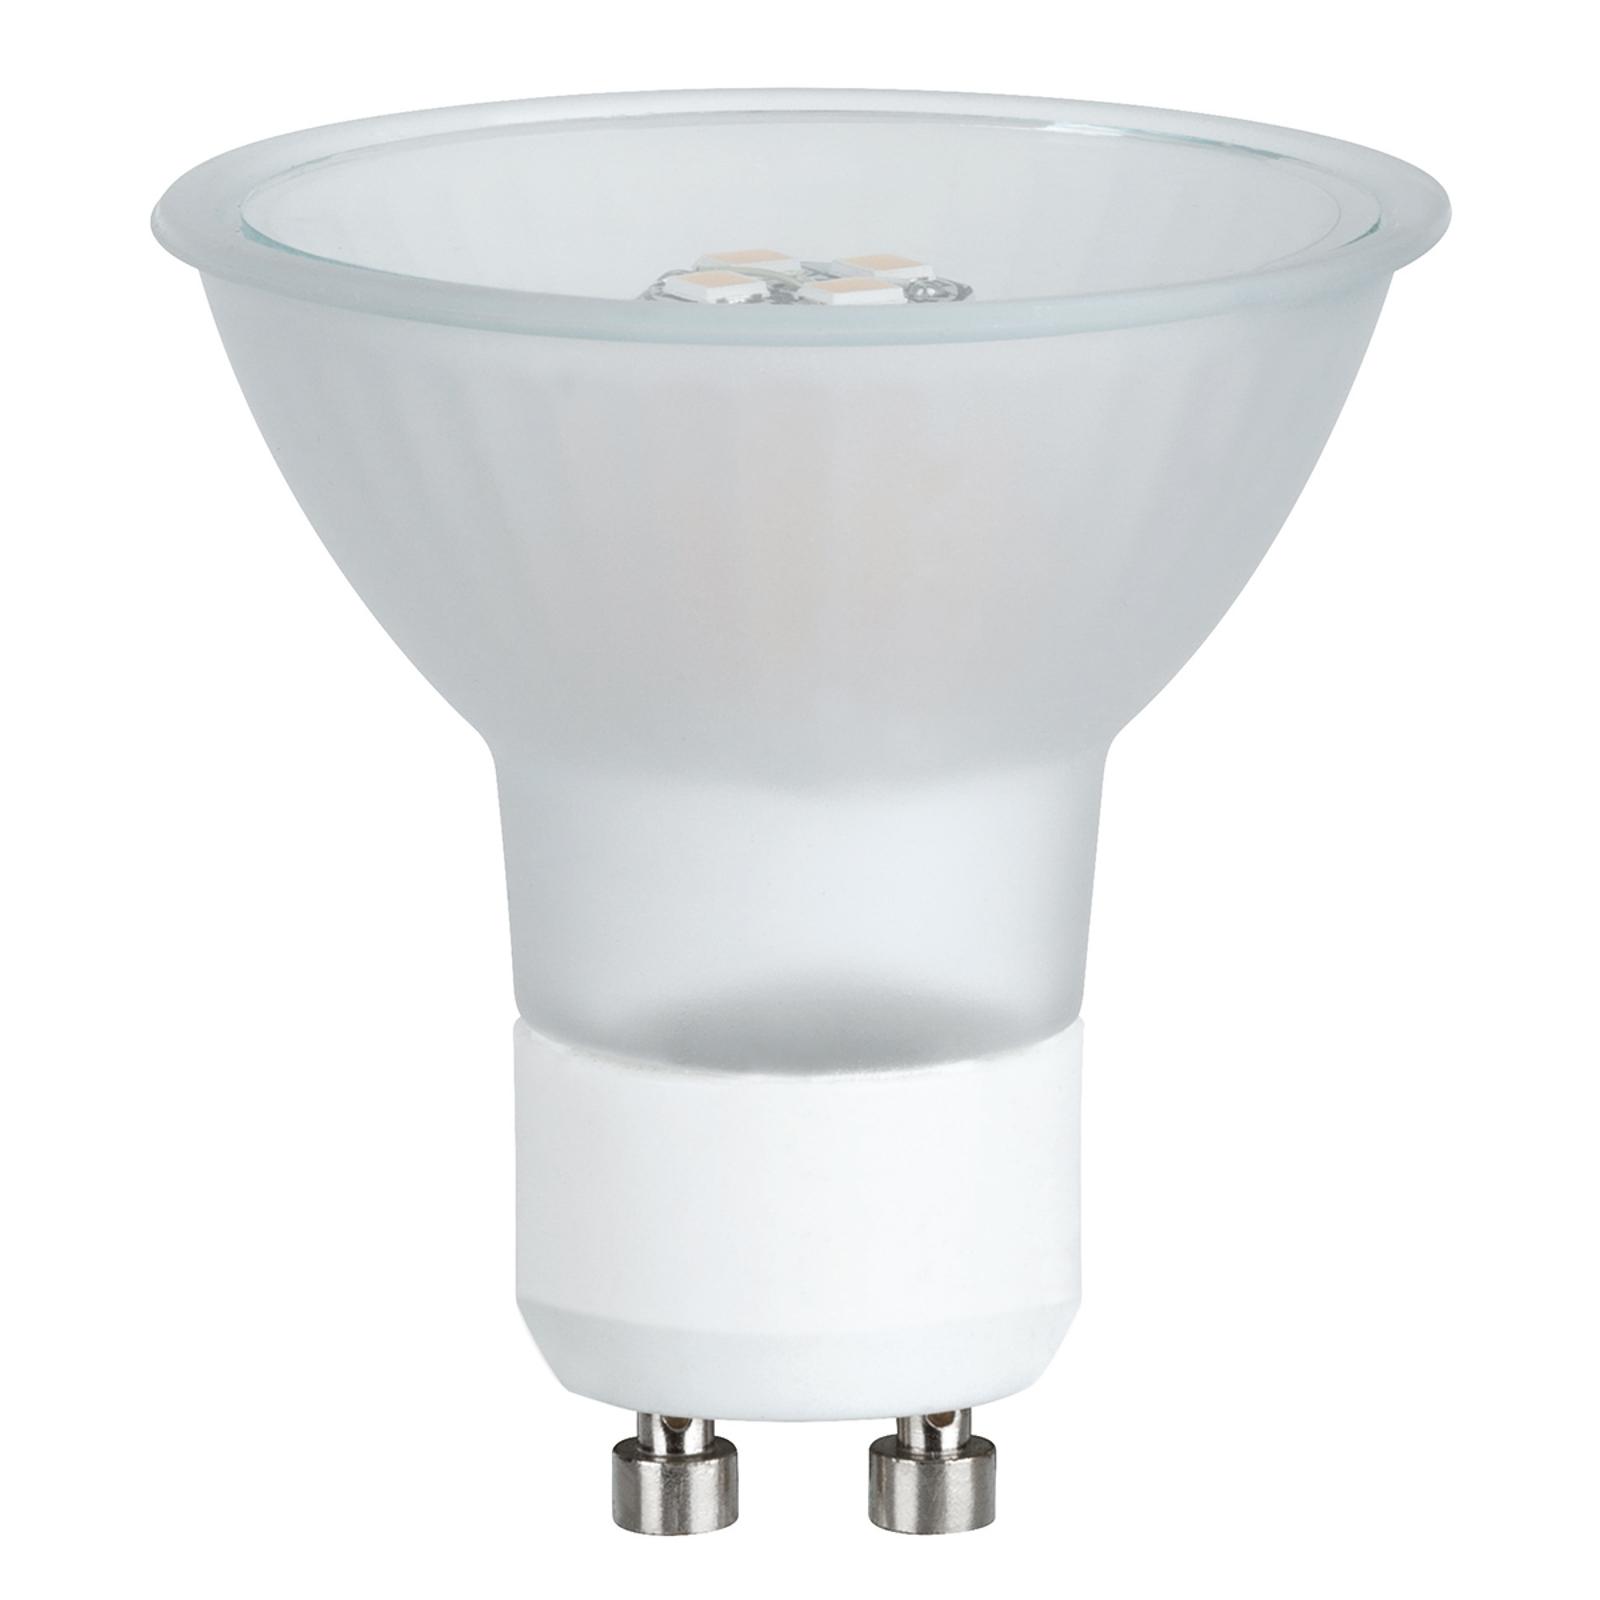 LED à réflecteur GU10 3,5W 827 MAXIFLOOD softopal